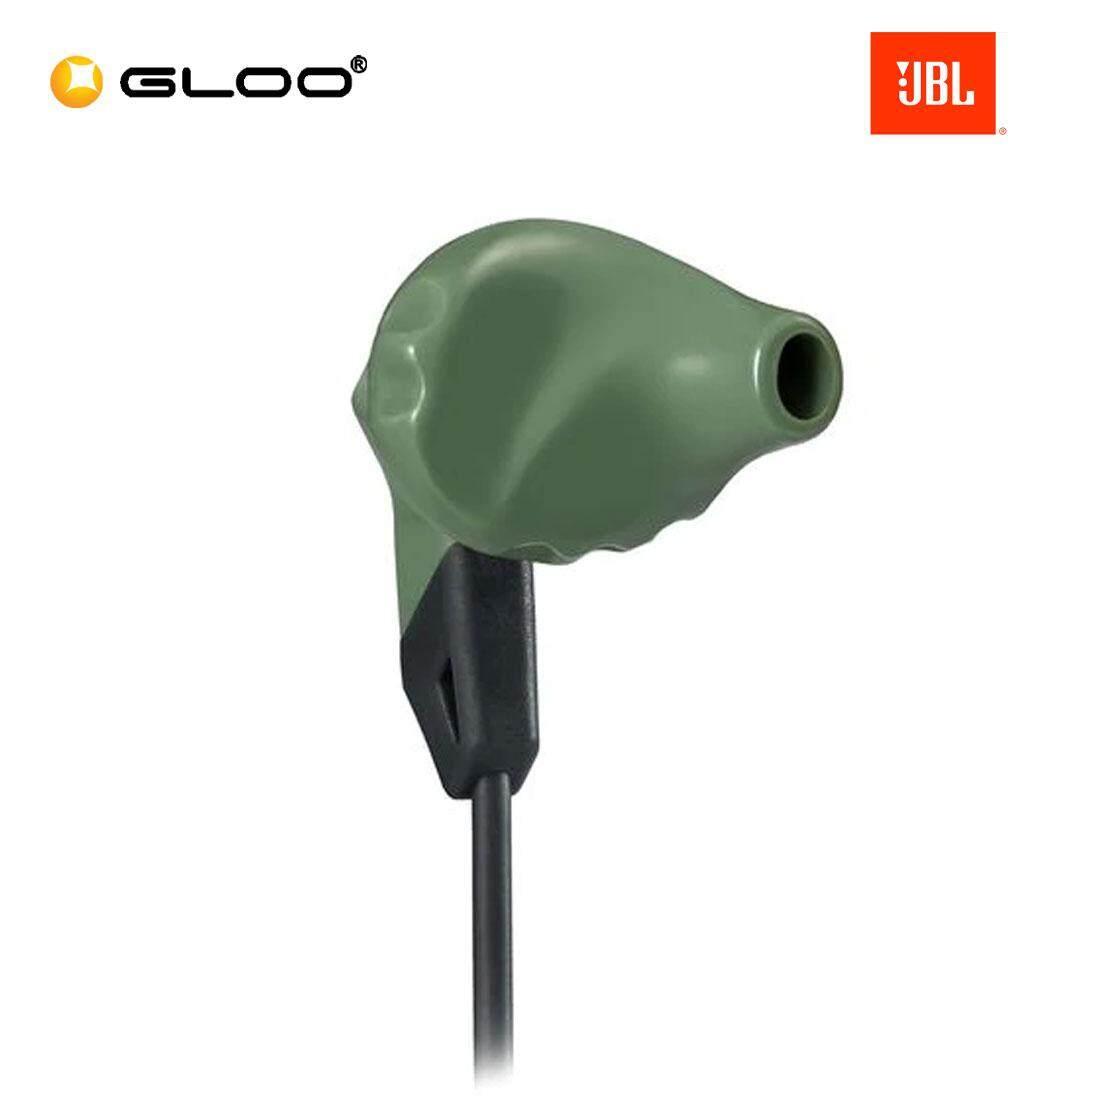 JBL Grip 200 (Blue/Mint/Charcoal/Olive)